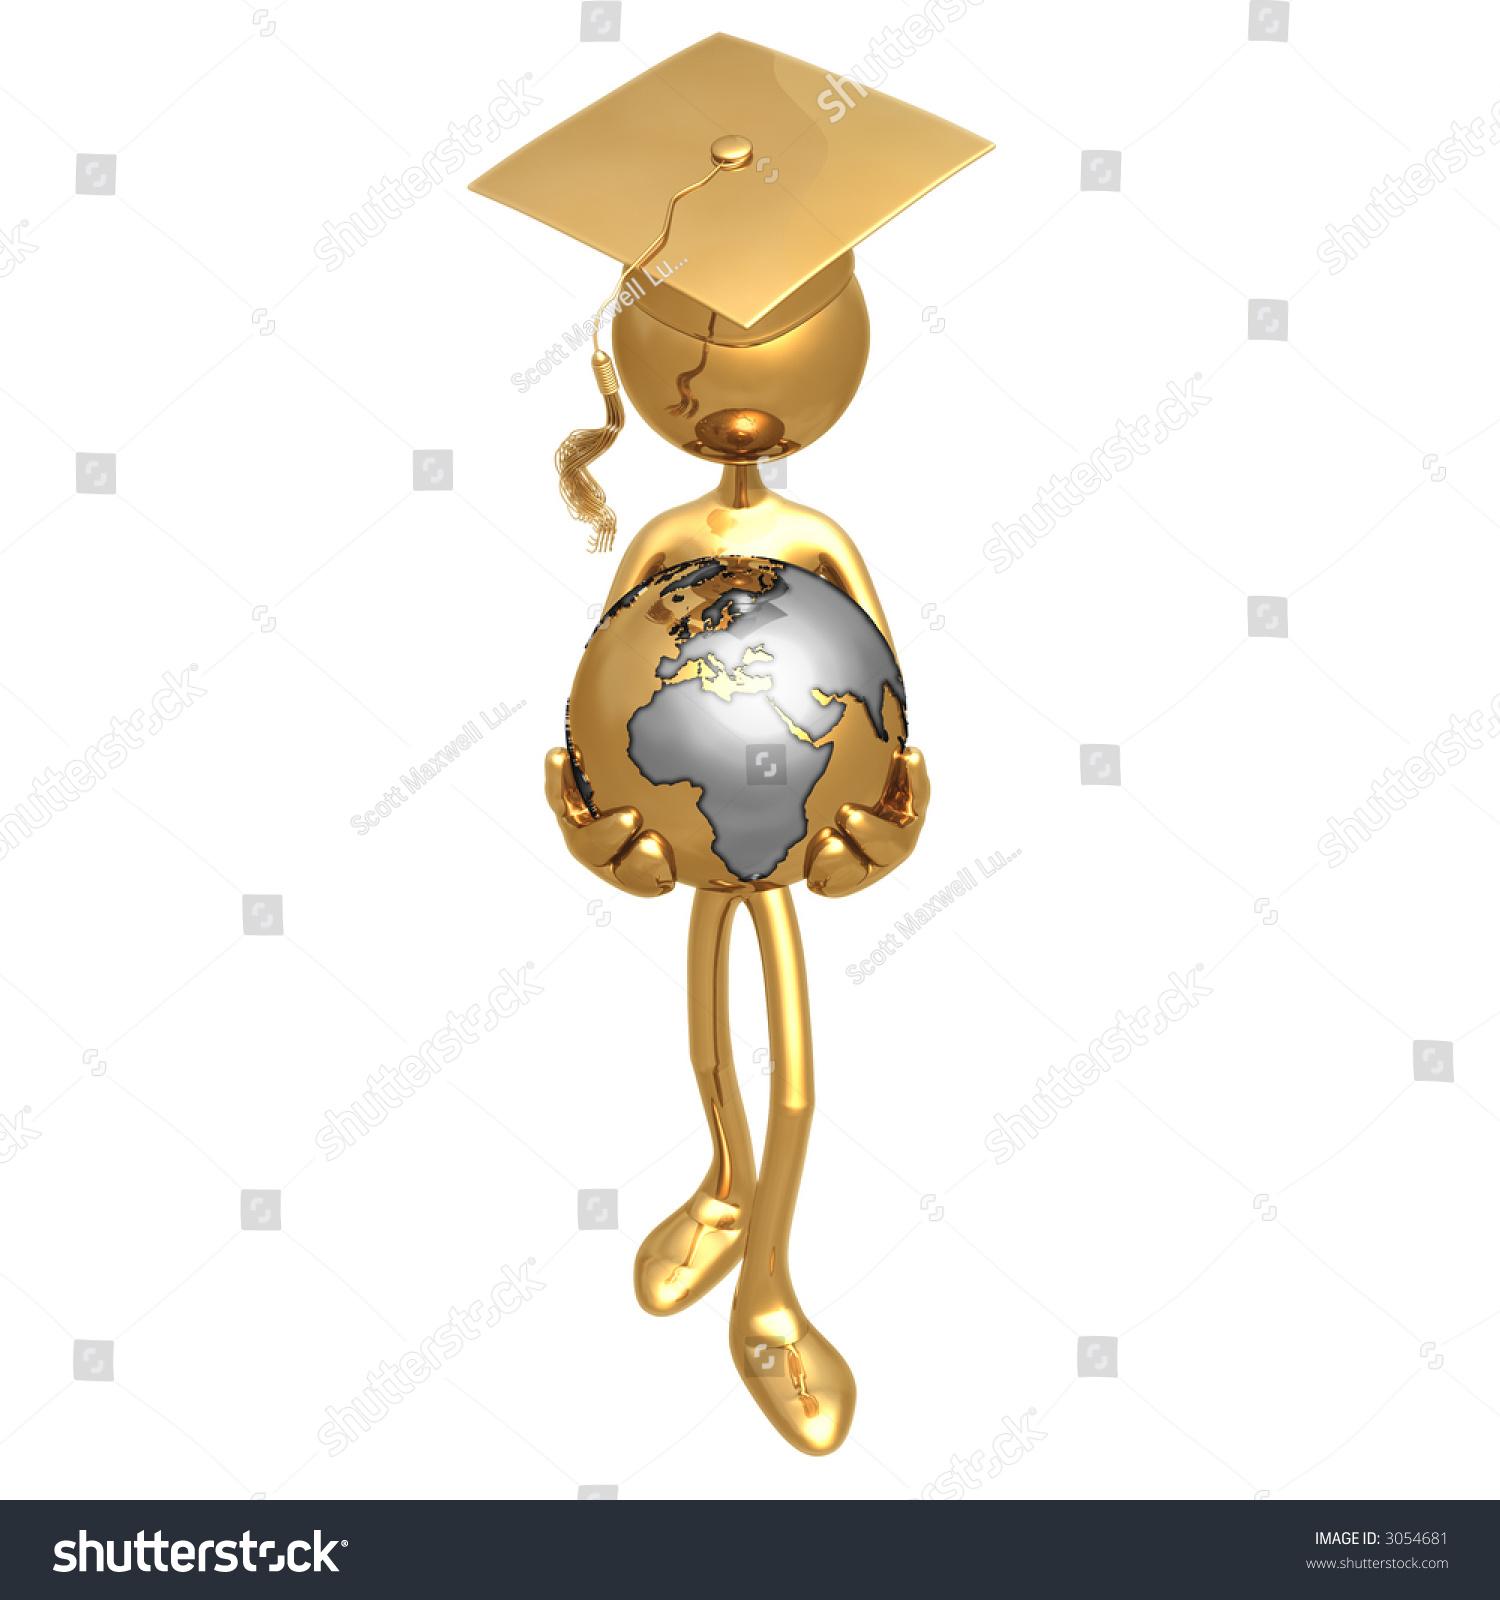 golden grad with world in hands graduation concept stock photo 3054681 shutterstock. Black Bedroom Furniture Sets. Home Design Ideas